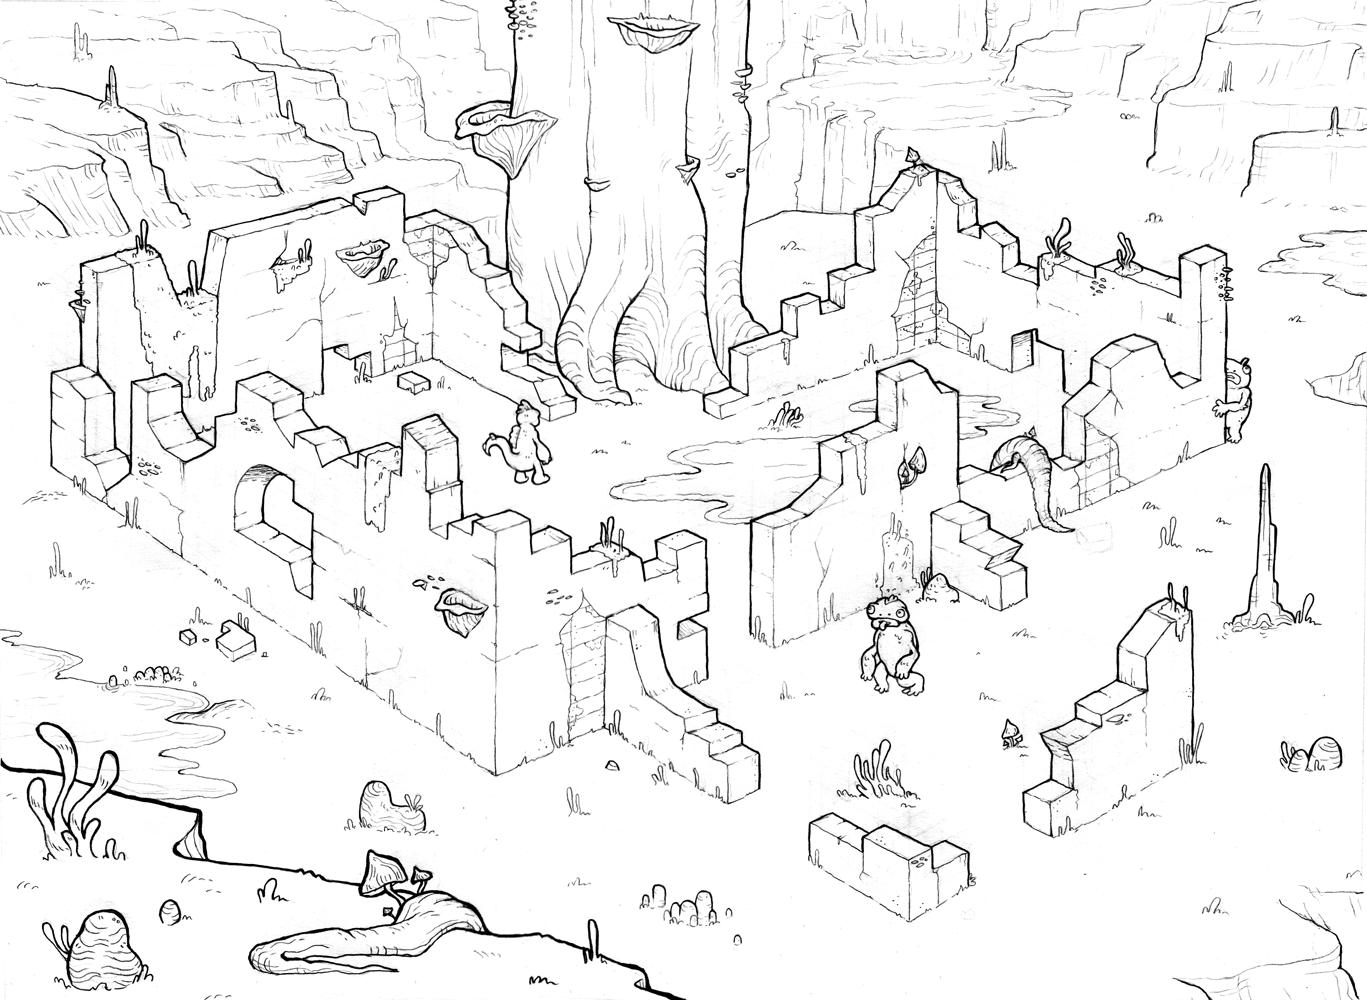 Perspective ruins homework by Smirking Raven